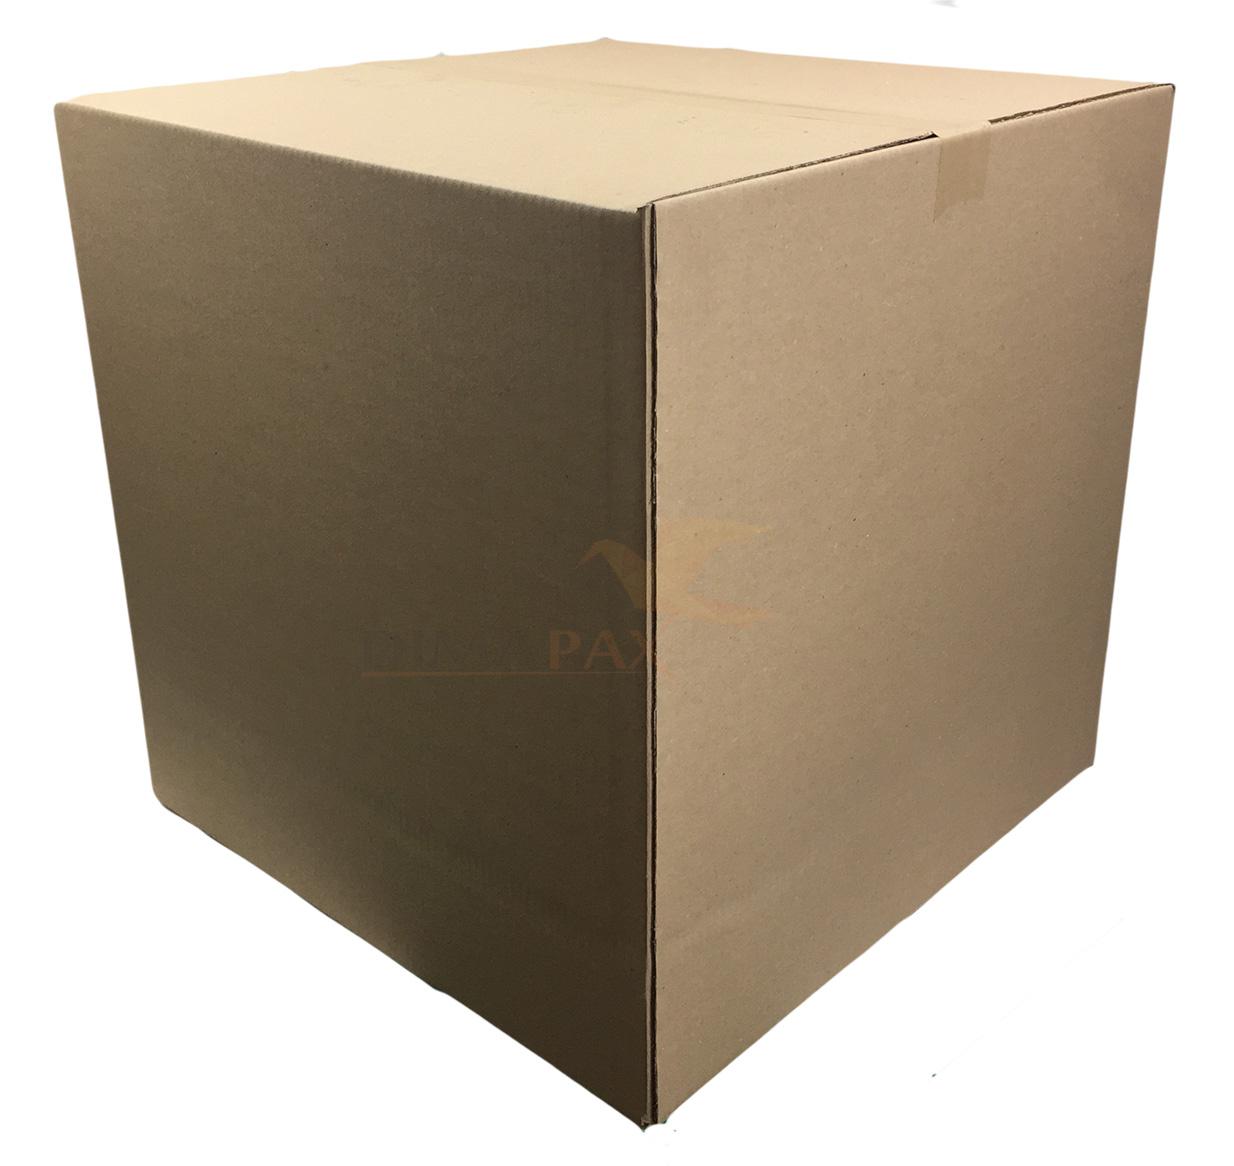 top karton versand falt kartons verpackungen schachtel box. Black Bedroom Furniture Sets. Home Design Ideas